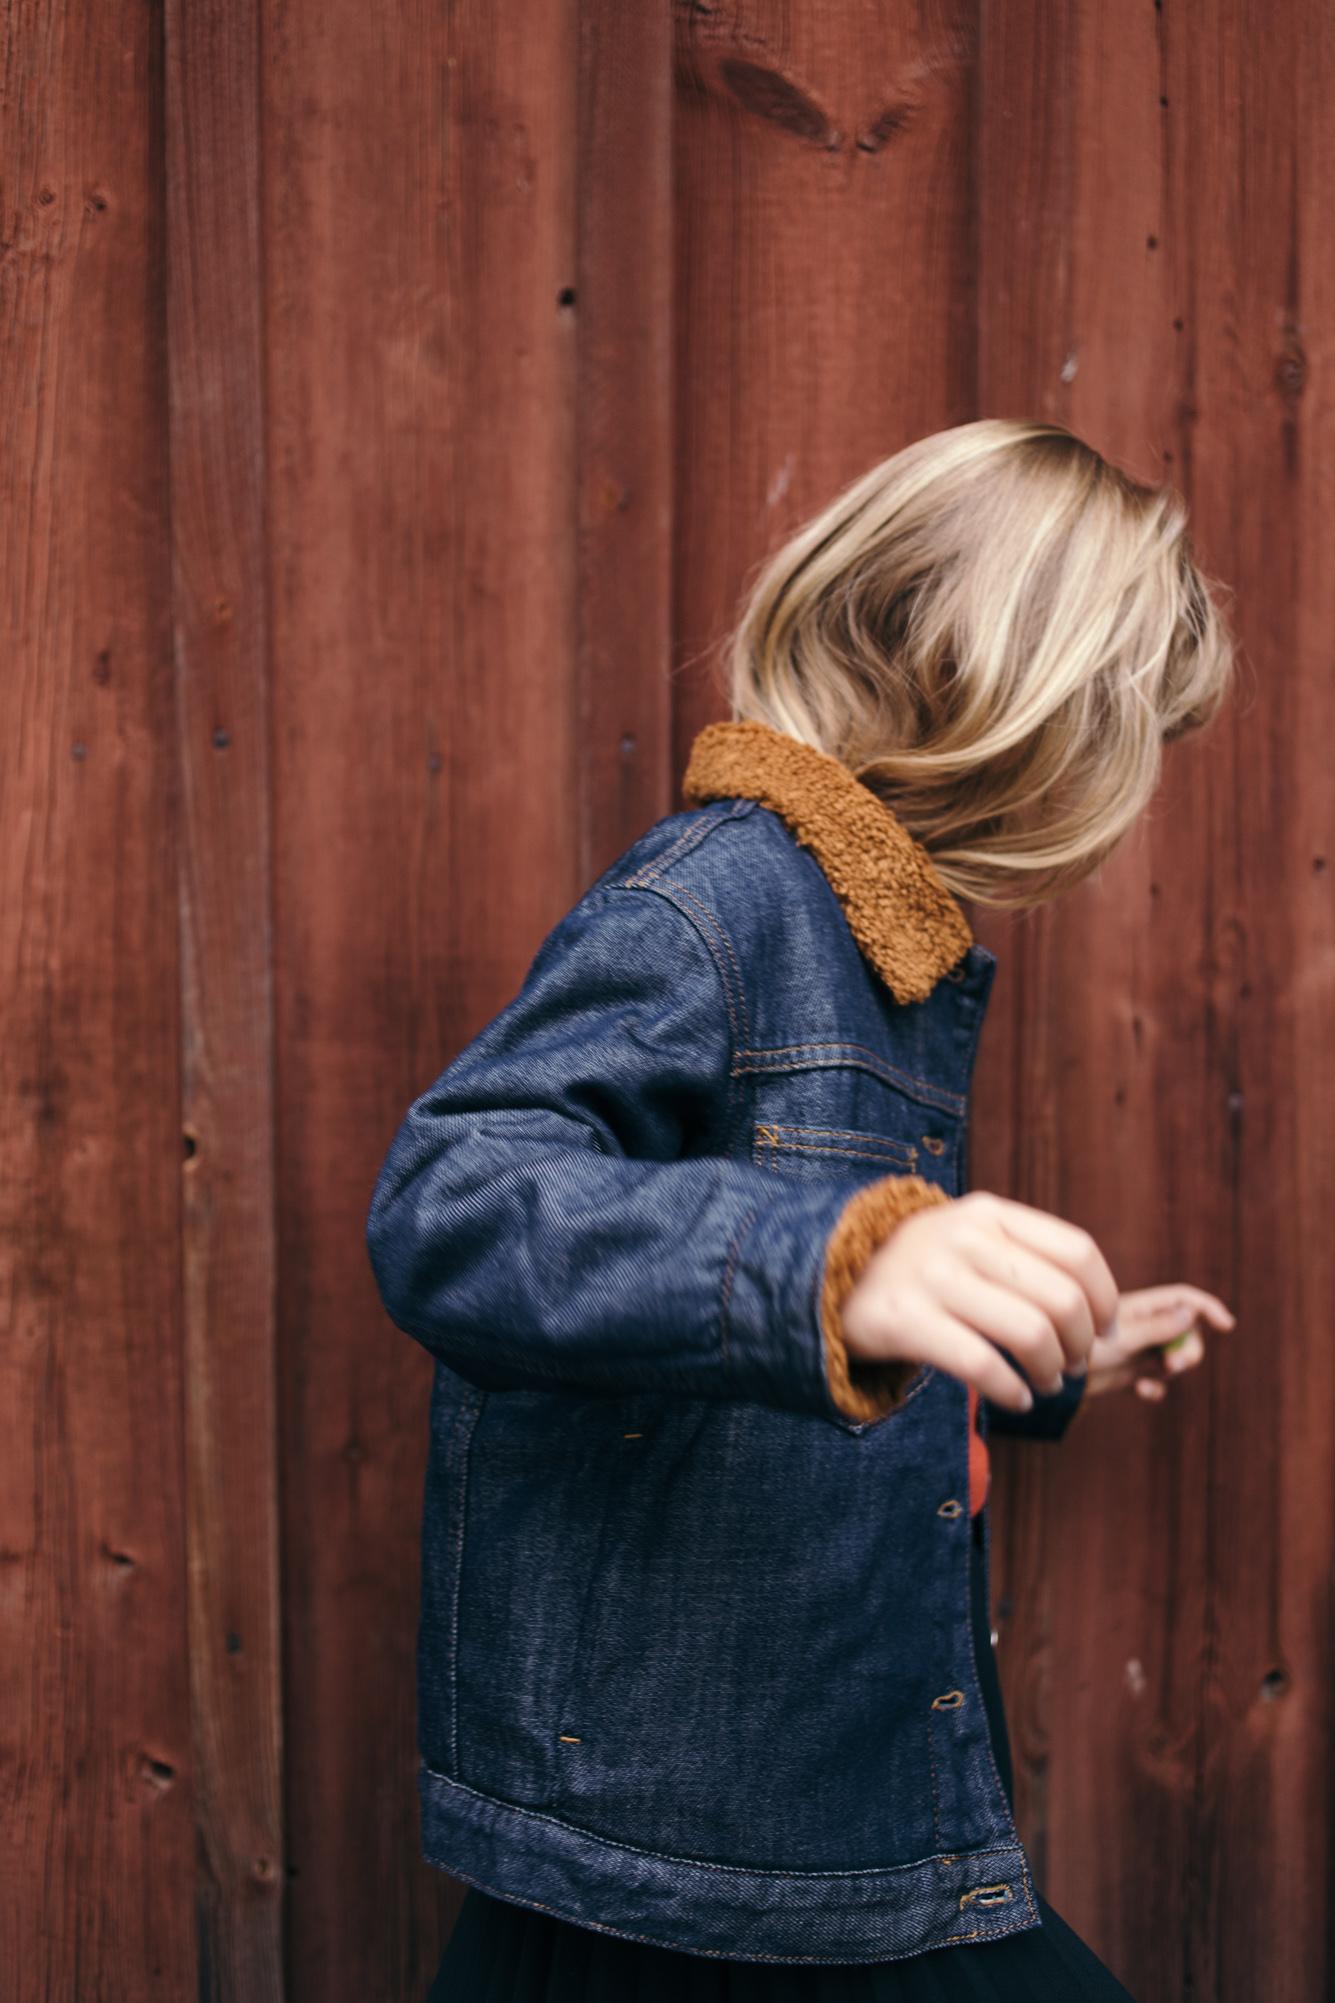 stockholm-kids-cityguide-conbotasdeagua-12.jpg